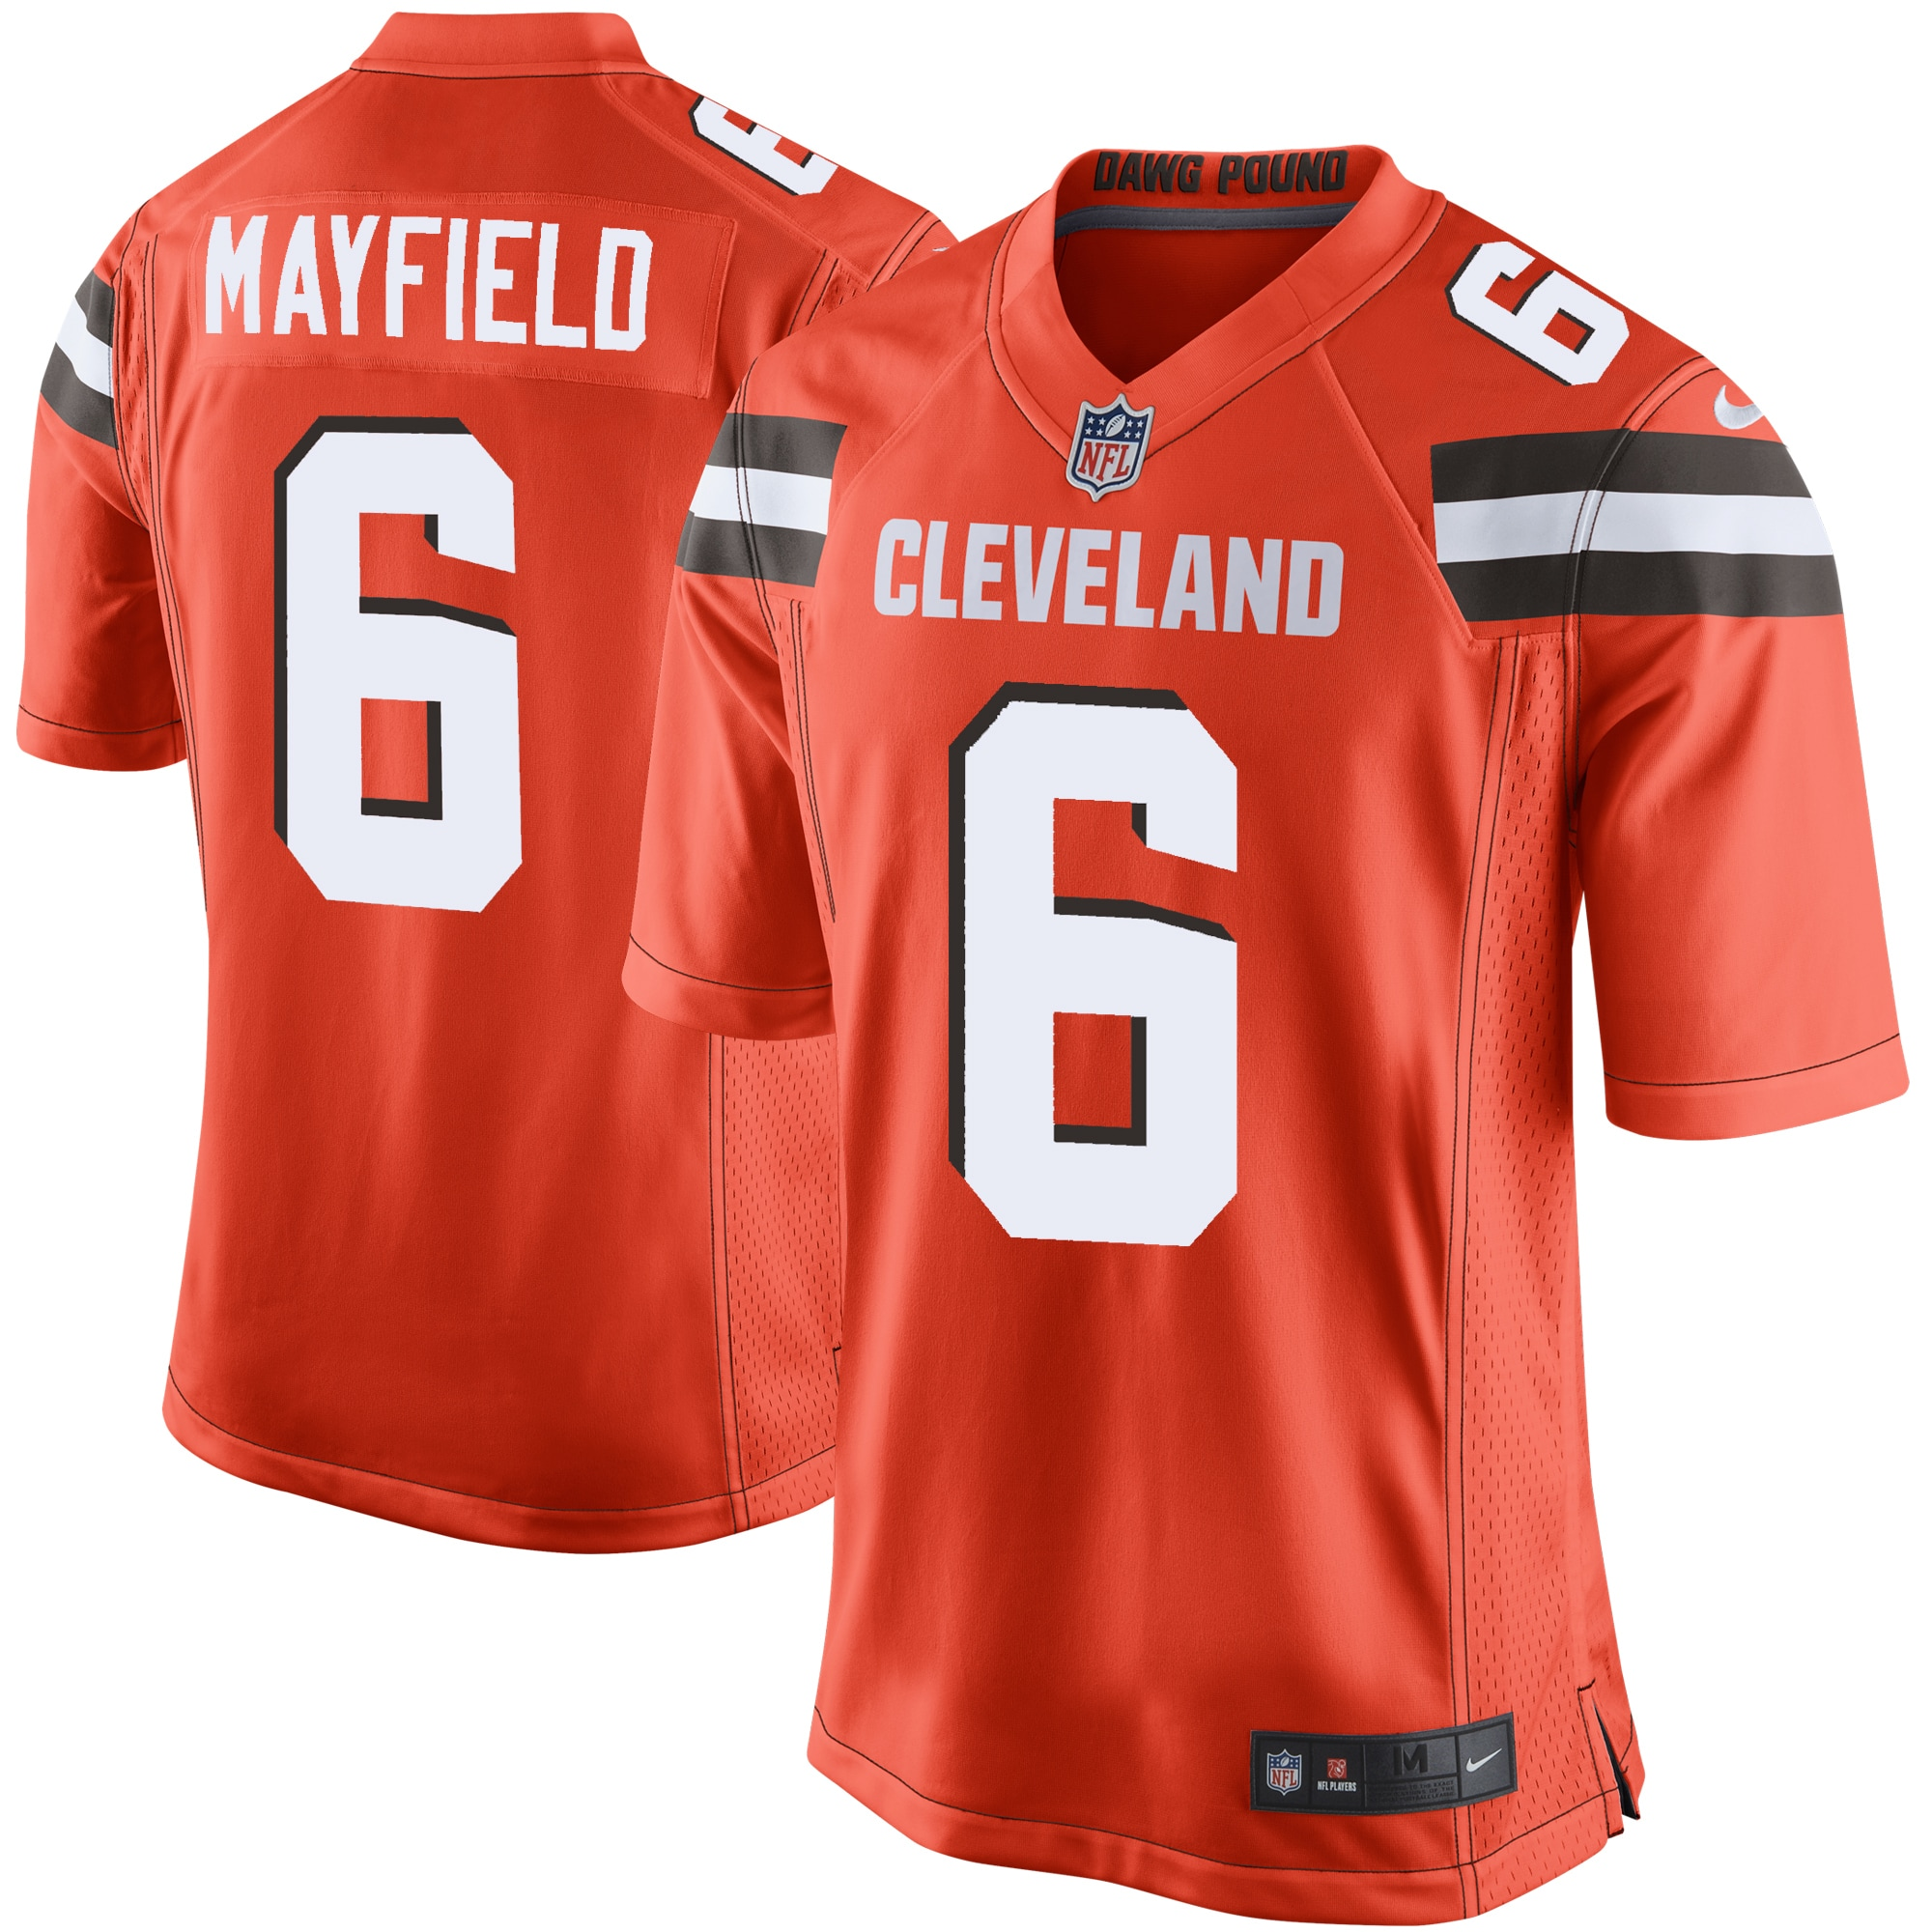 Baker Mayfield Cleveland Browns Nike Game Jersey - Orange